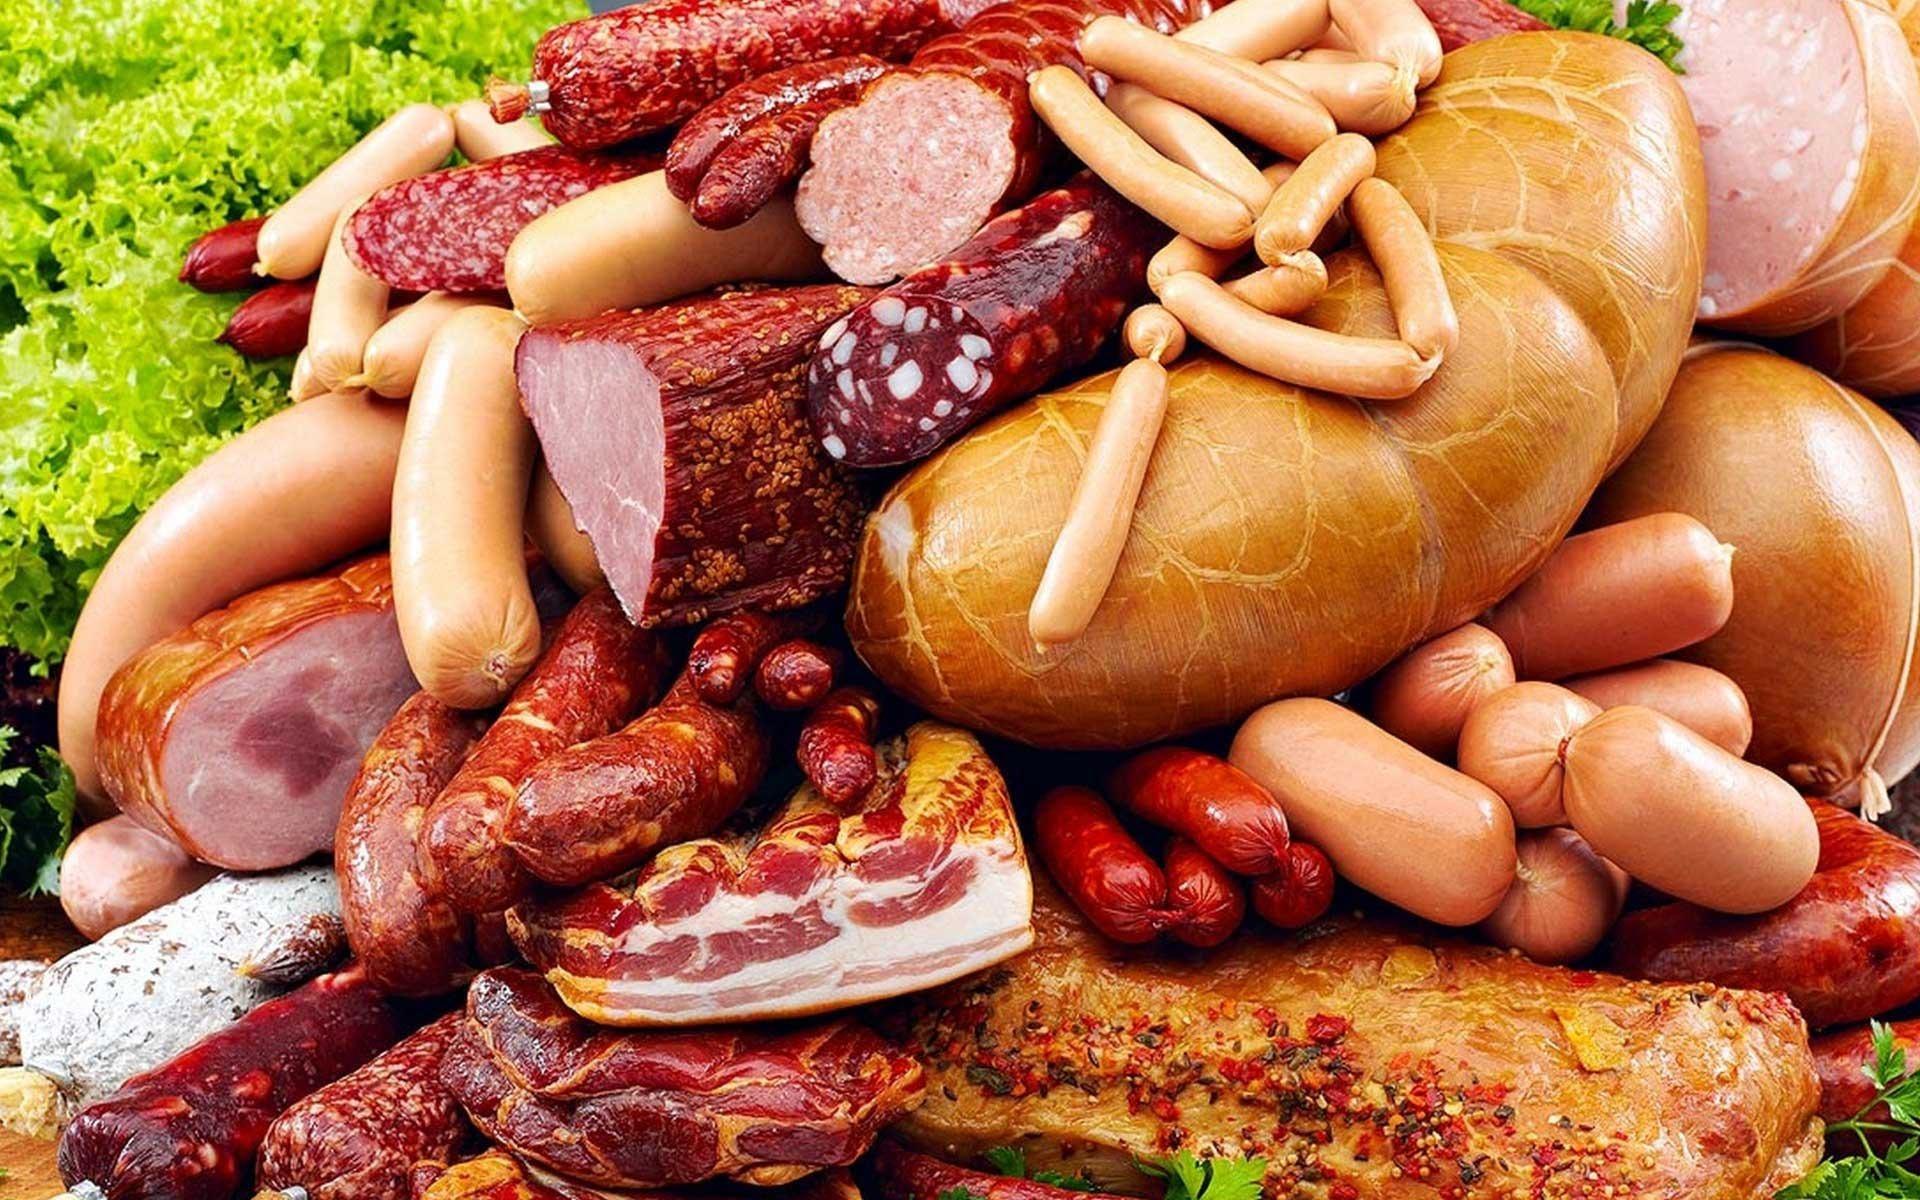 FOOD GRADE ADDITIVES